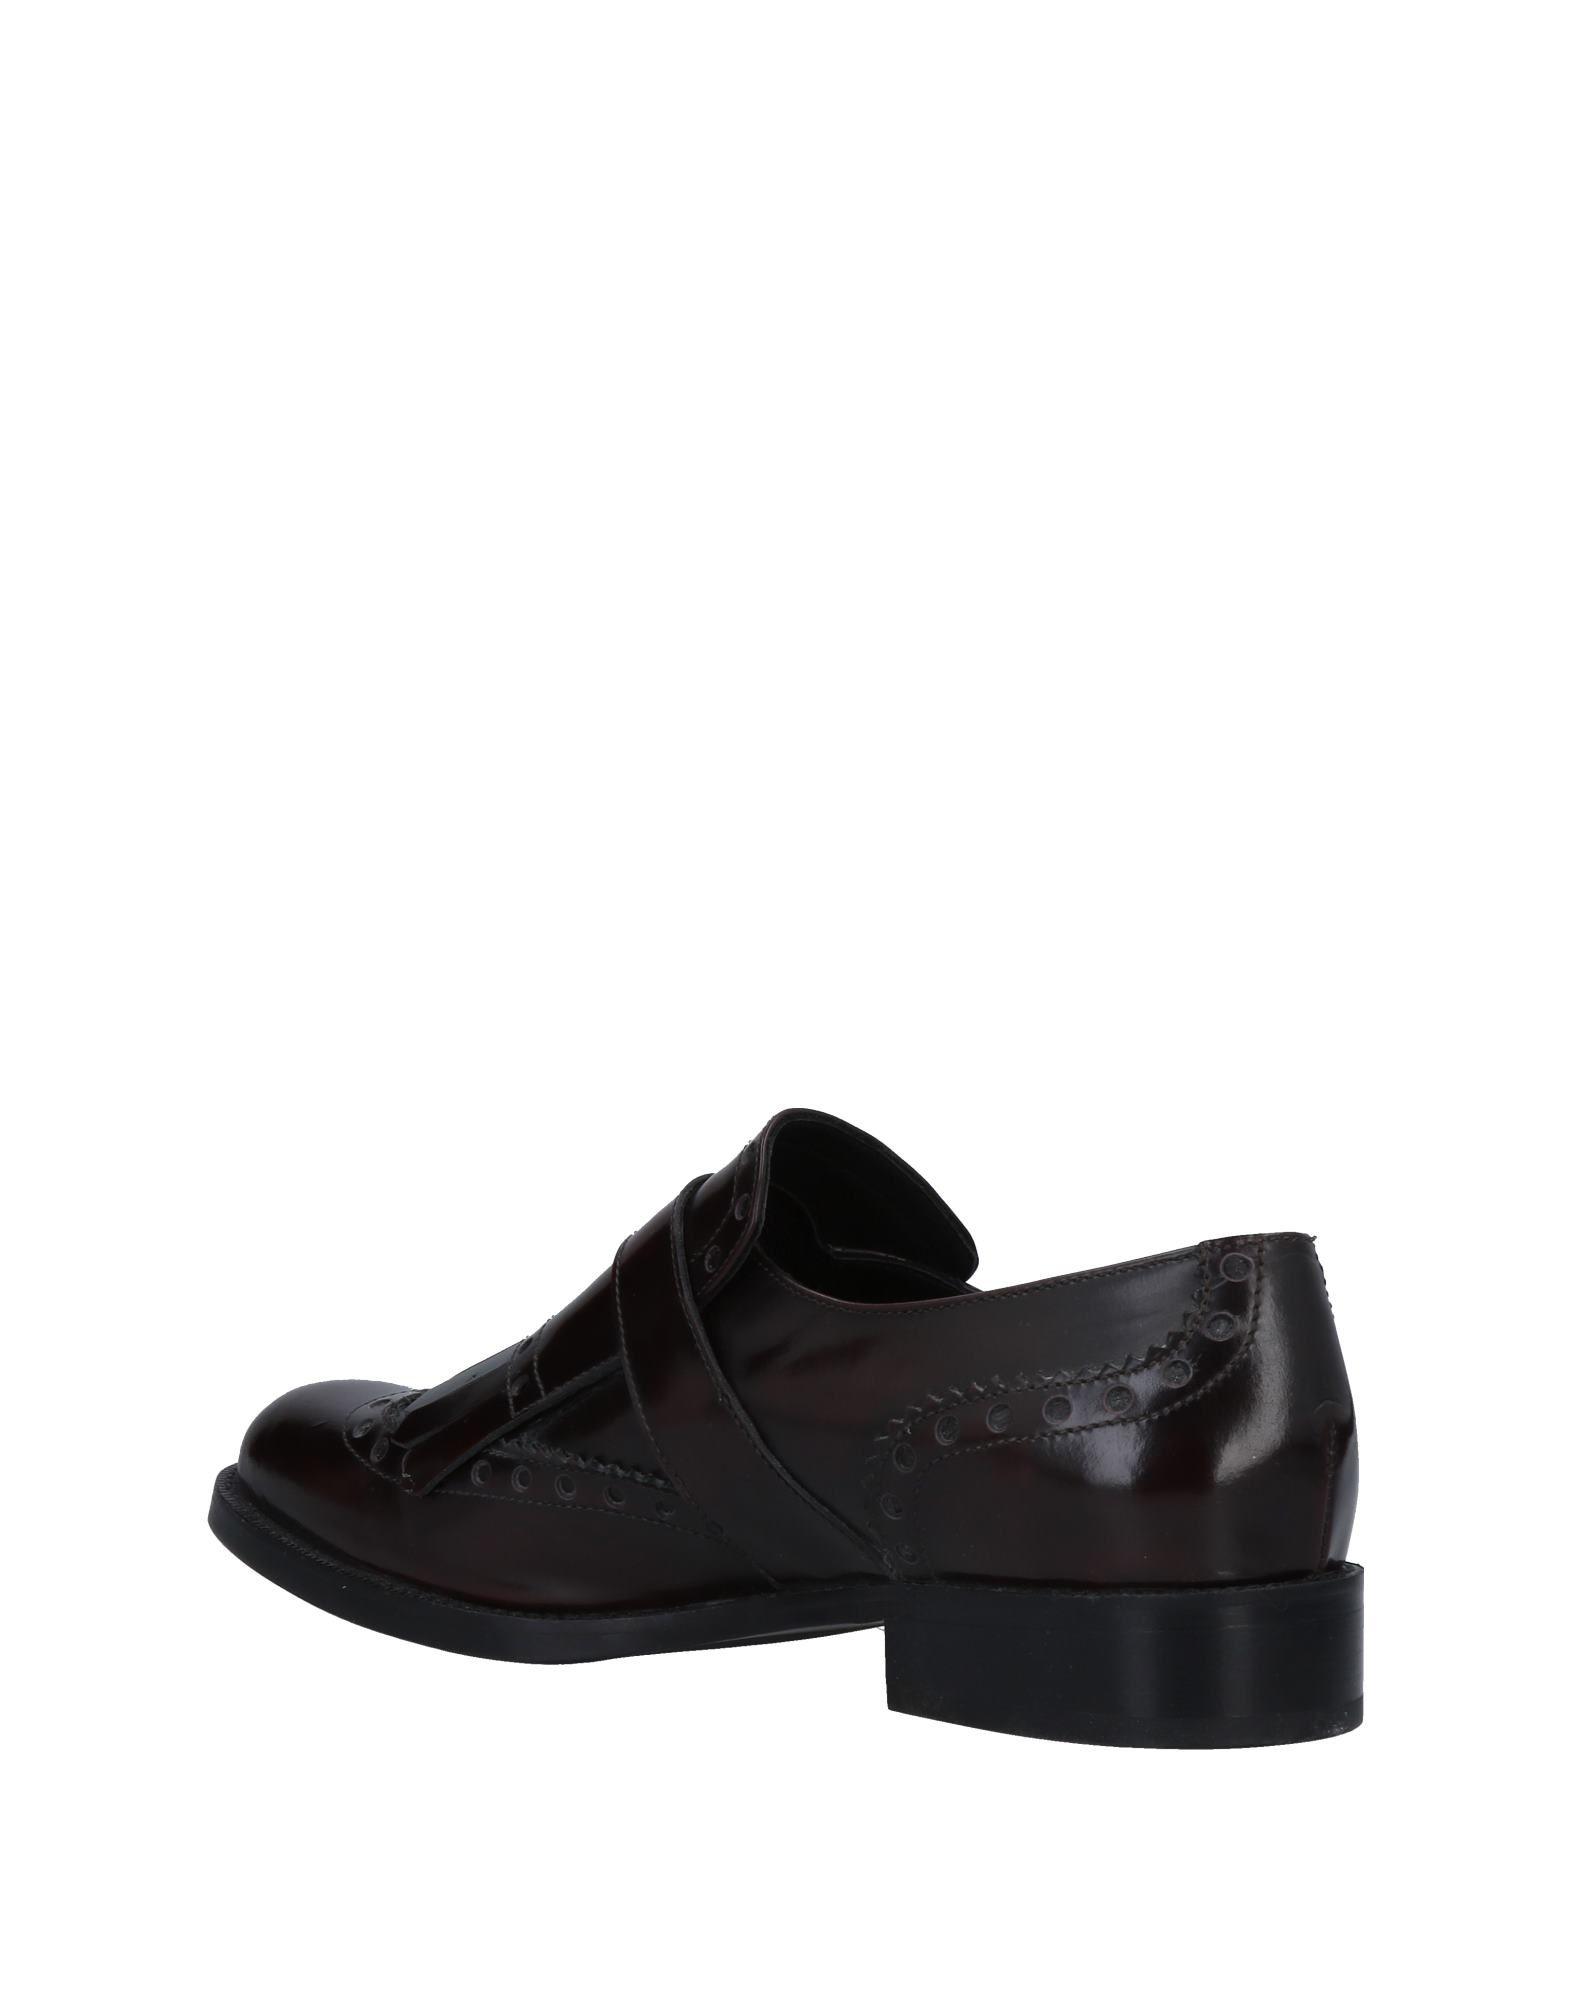 Oregon Mokassins Damen   Damen 11488114QE Heiße Schuhe ae0c0a